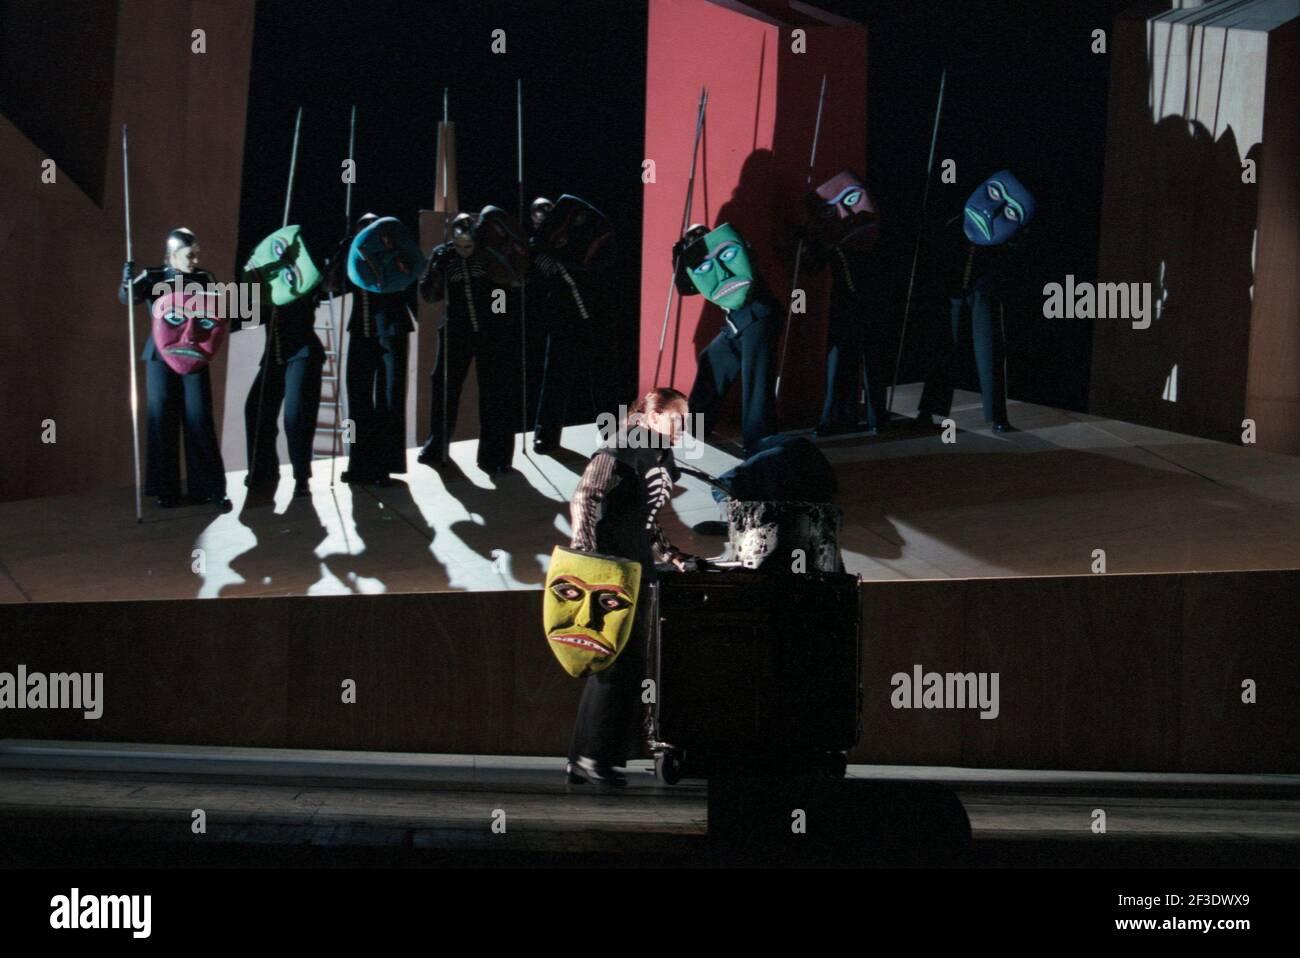 Deborah Polaski (Brunnhilde) con Valkyries in DIE WALKMAN di Wagner alla Royal Opera, Covent Garden, Londra WC2 30/09/1996 direttore: Bernard Haitink design: Nigel Lowery illuminazione: Pat Collins regista: Richard Jones Foto Stock